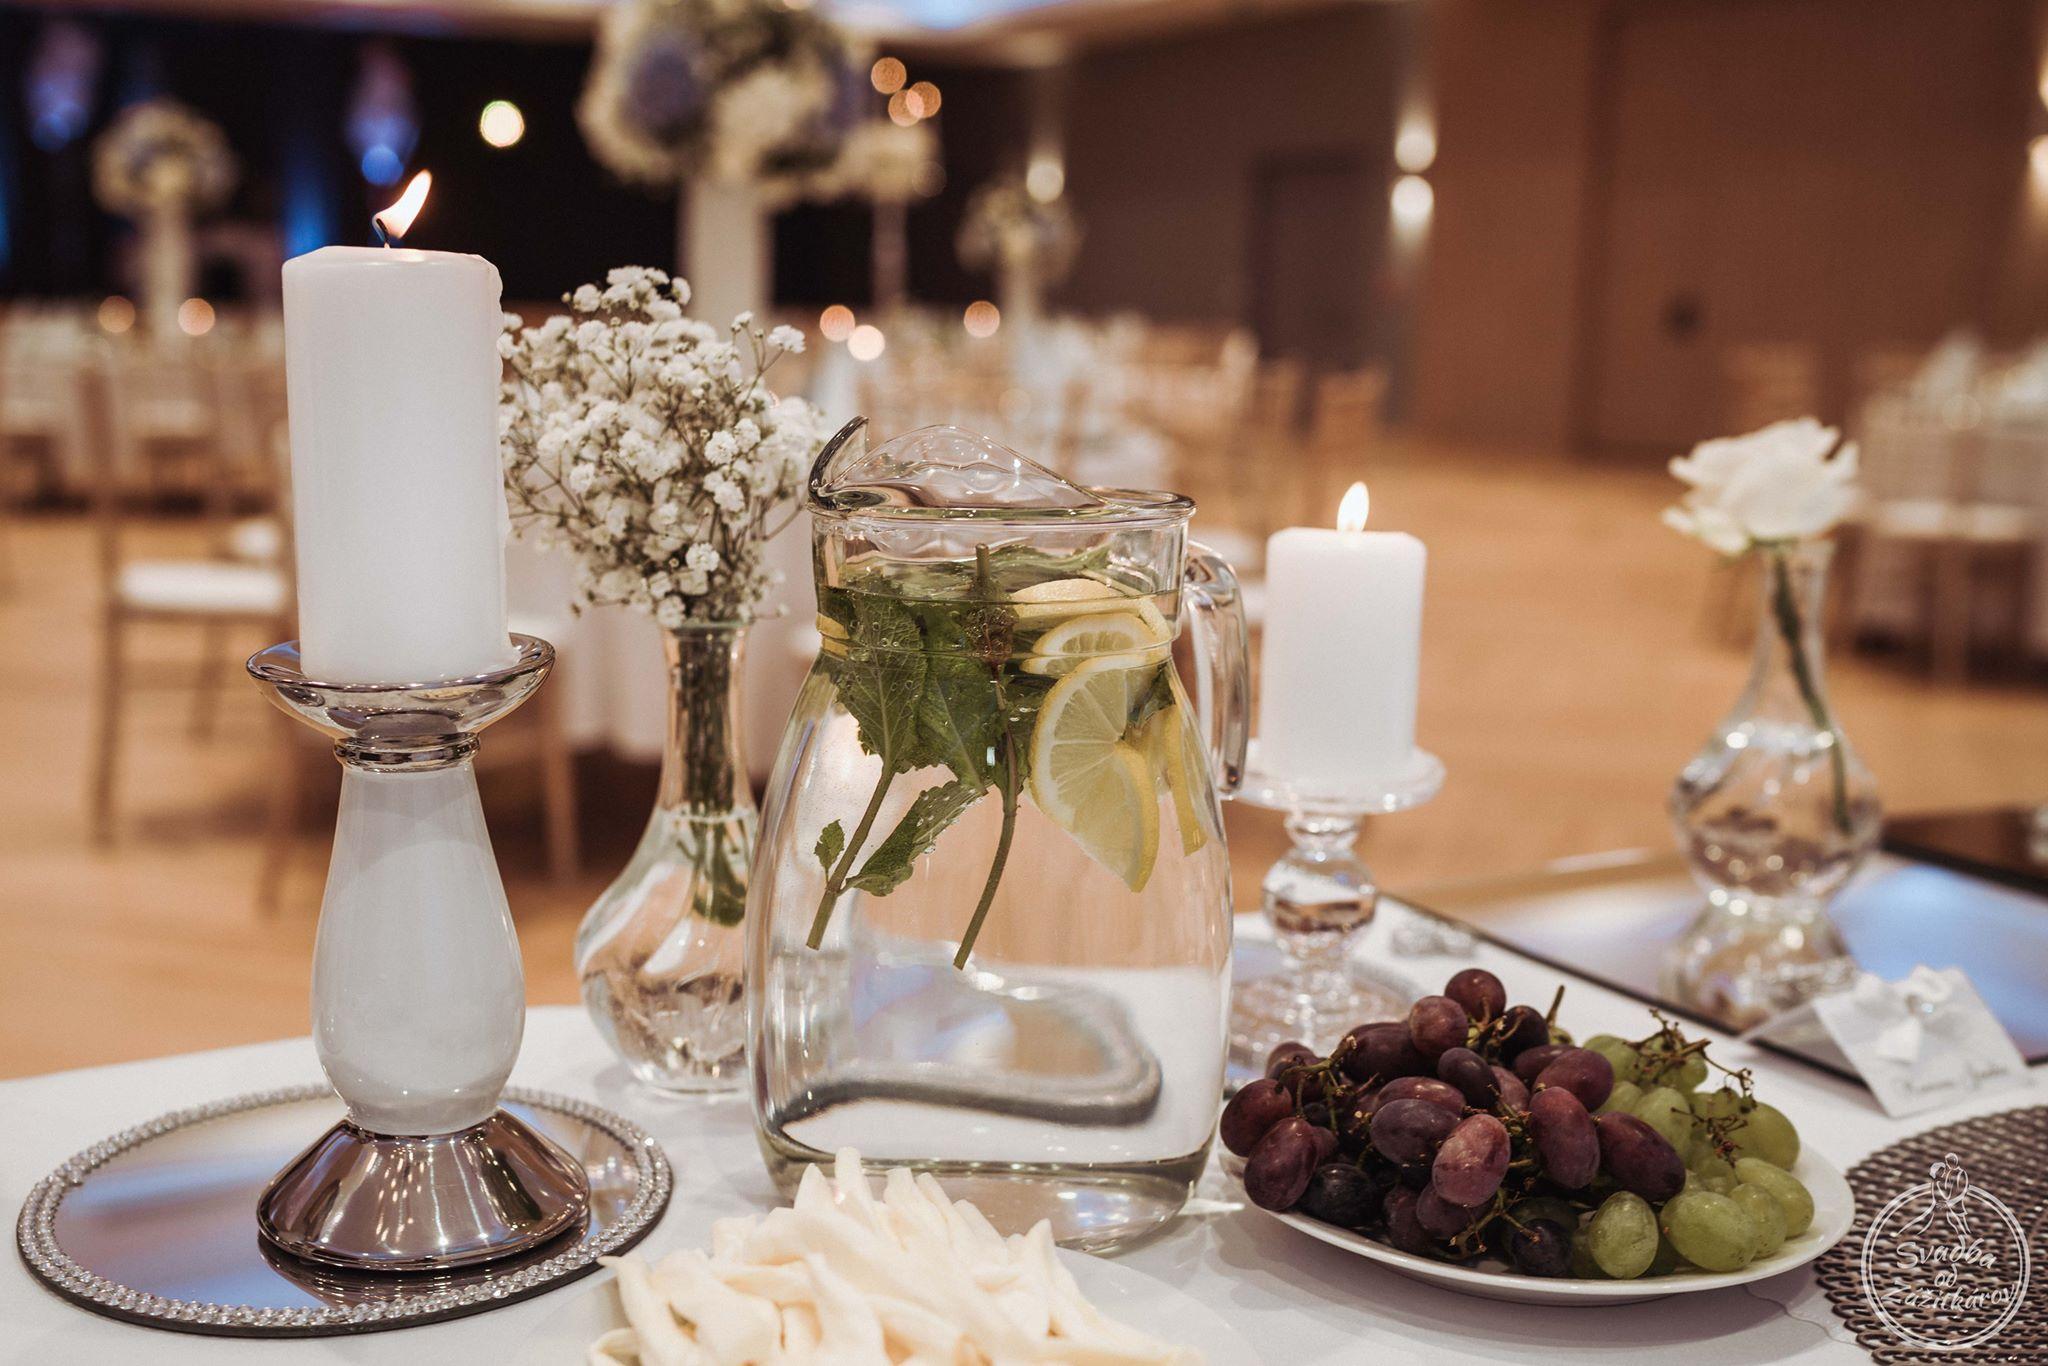 svadba-zilina-bratislava-modra-pezinok-nitrajpg